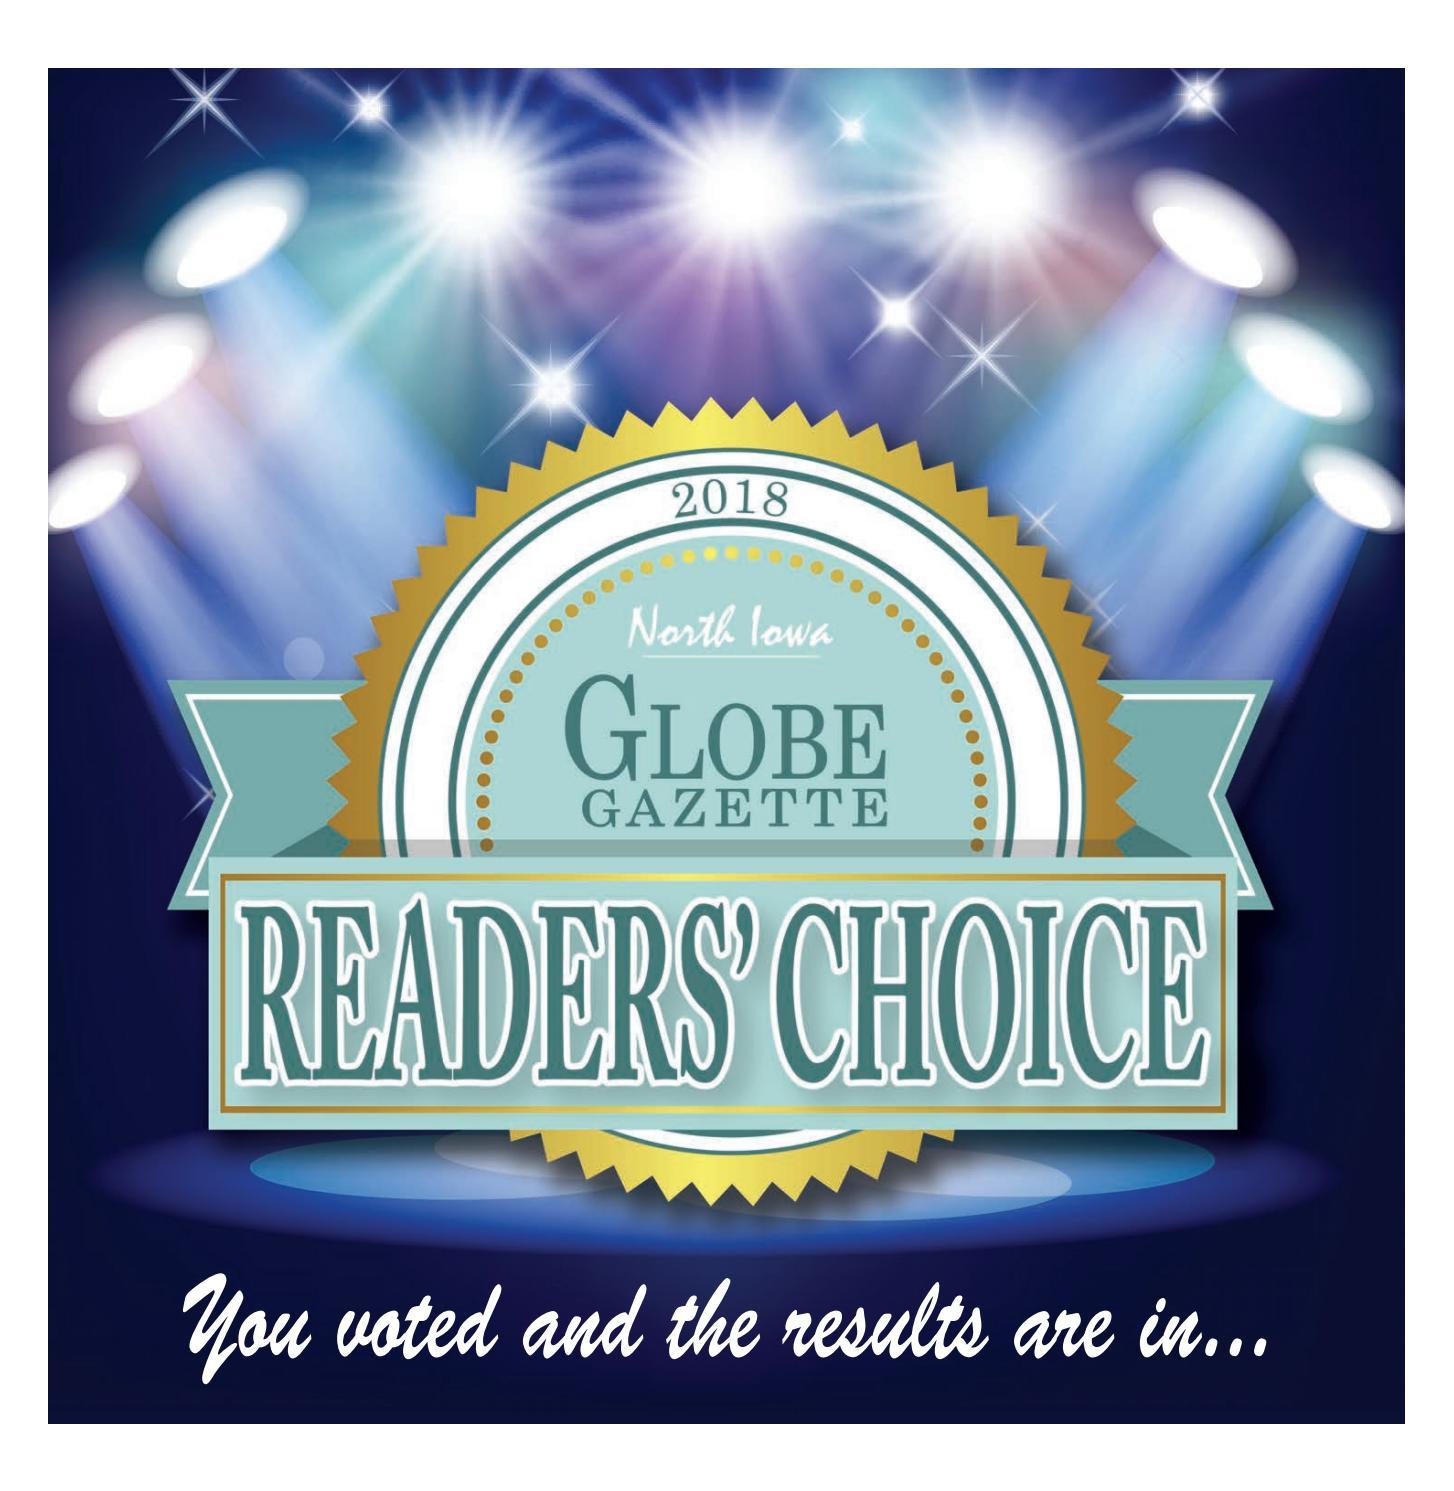 2018 Reader S Choice By Globe Gazette Issuu